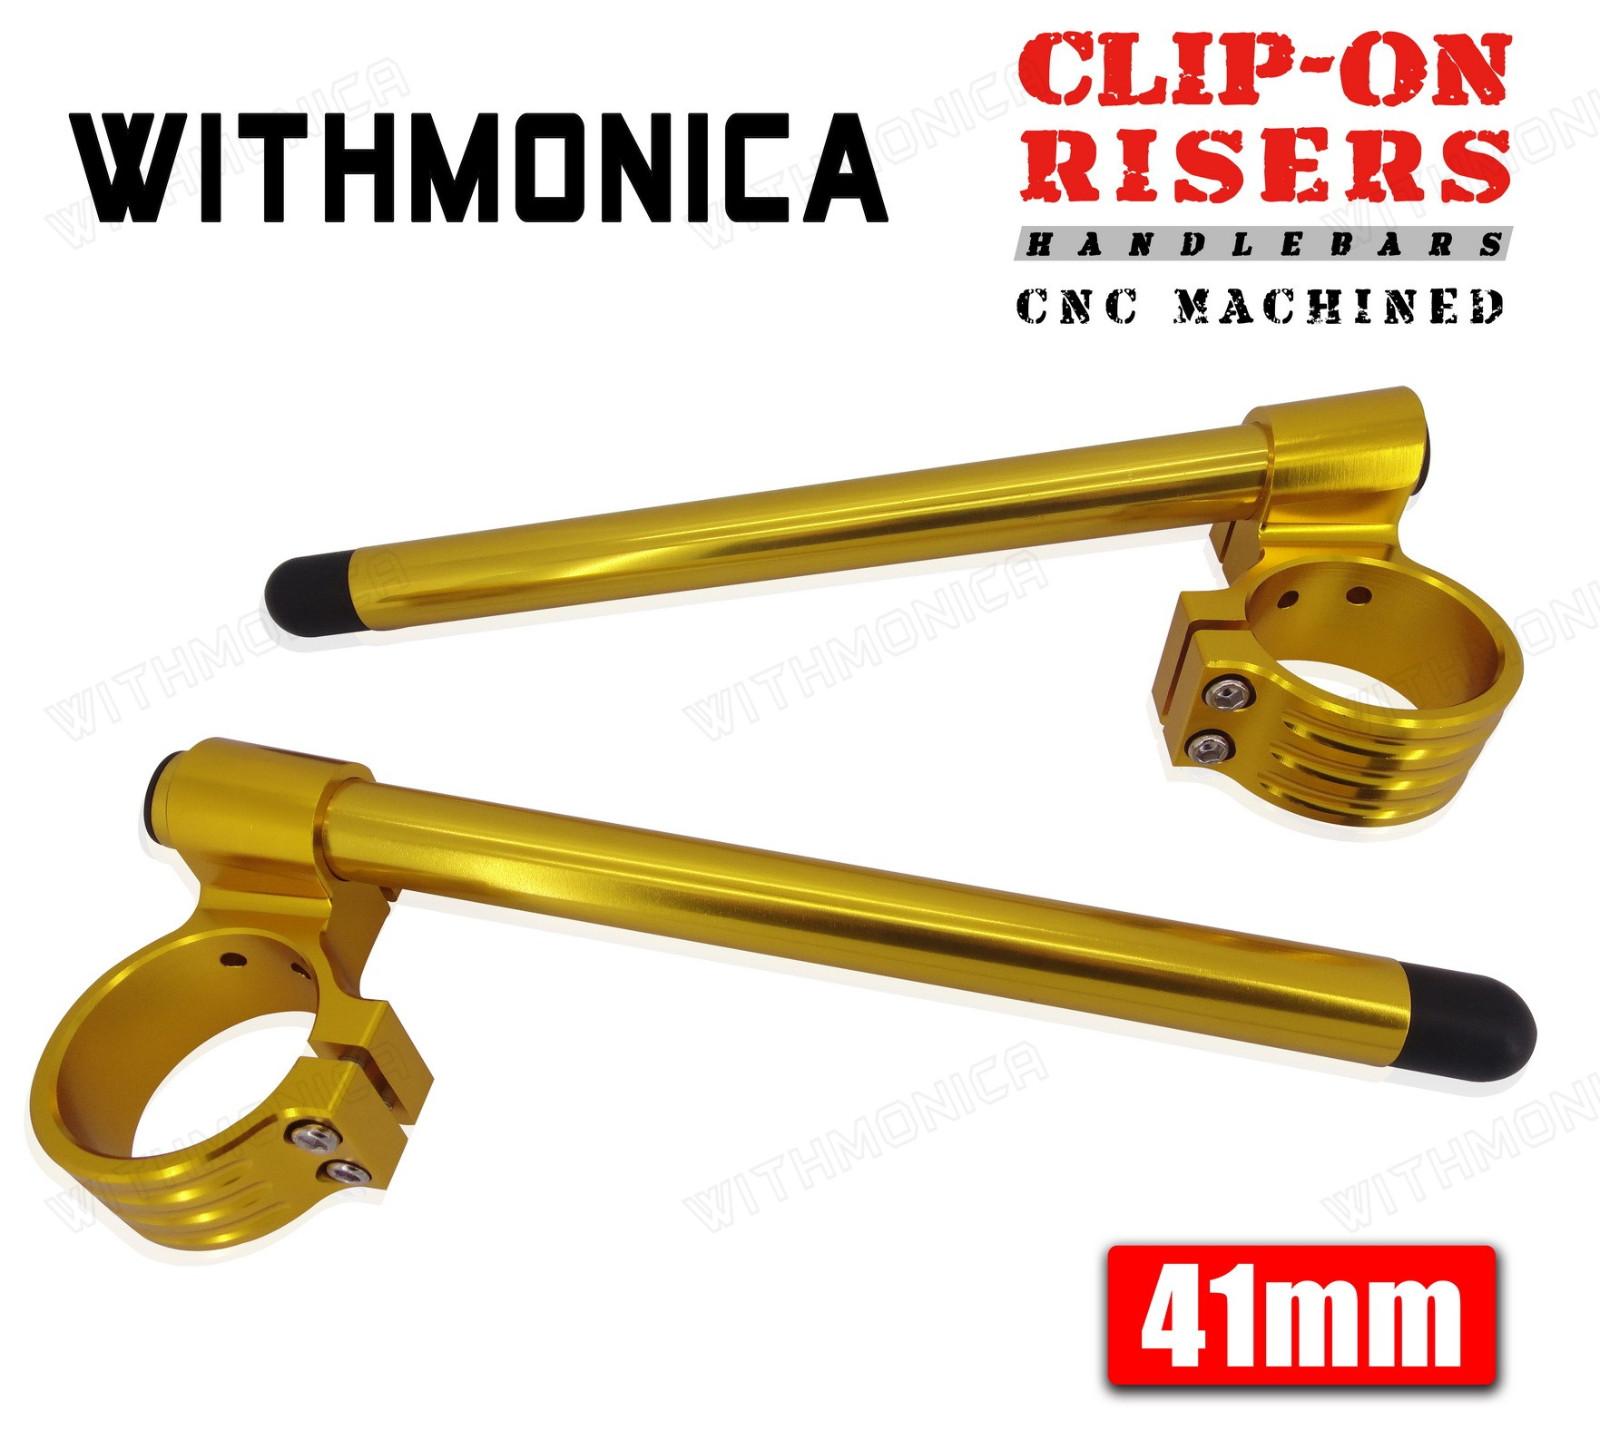 41mm Cnc 1 Riser Clip Ons Handlebar For Kawasaki Zzr 1100 Ninja Zx 1996 Wiring Diagram 11 1995 1997